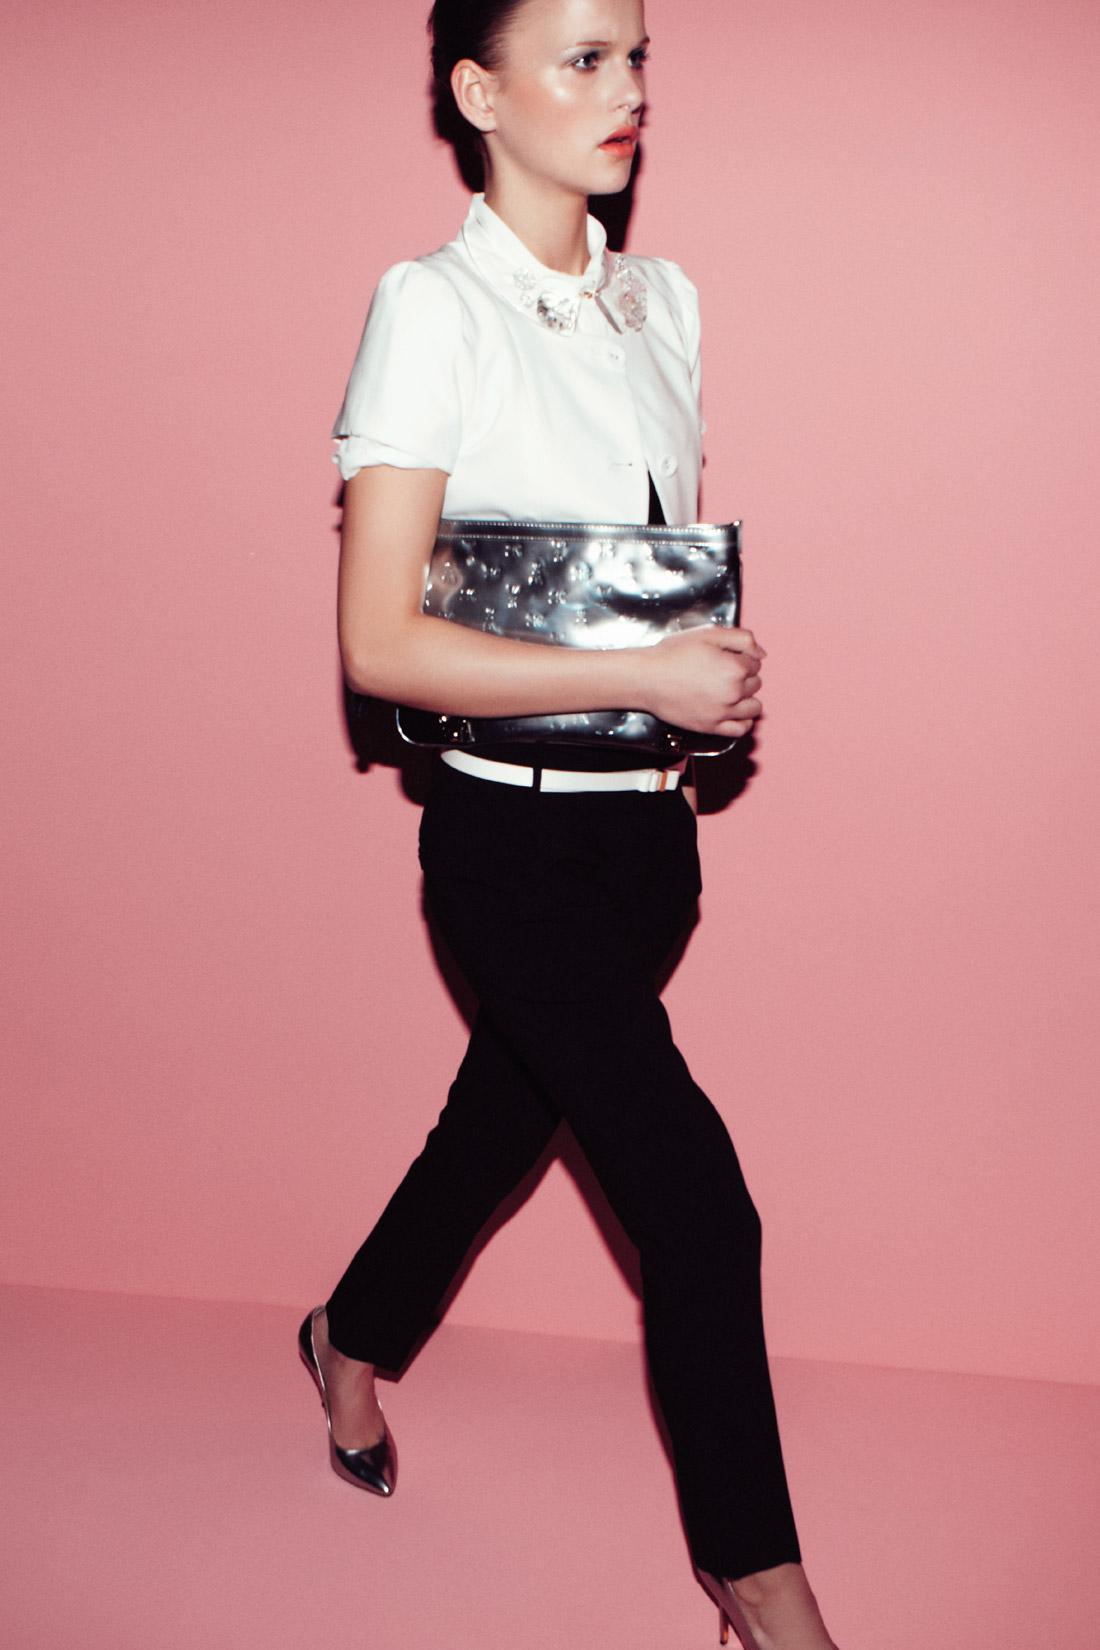 kopertówka Patrizia Pepe w kolorze srebrnym - trendy na wiosnę 2013